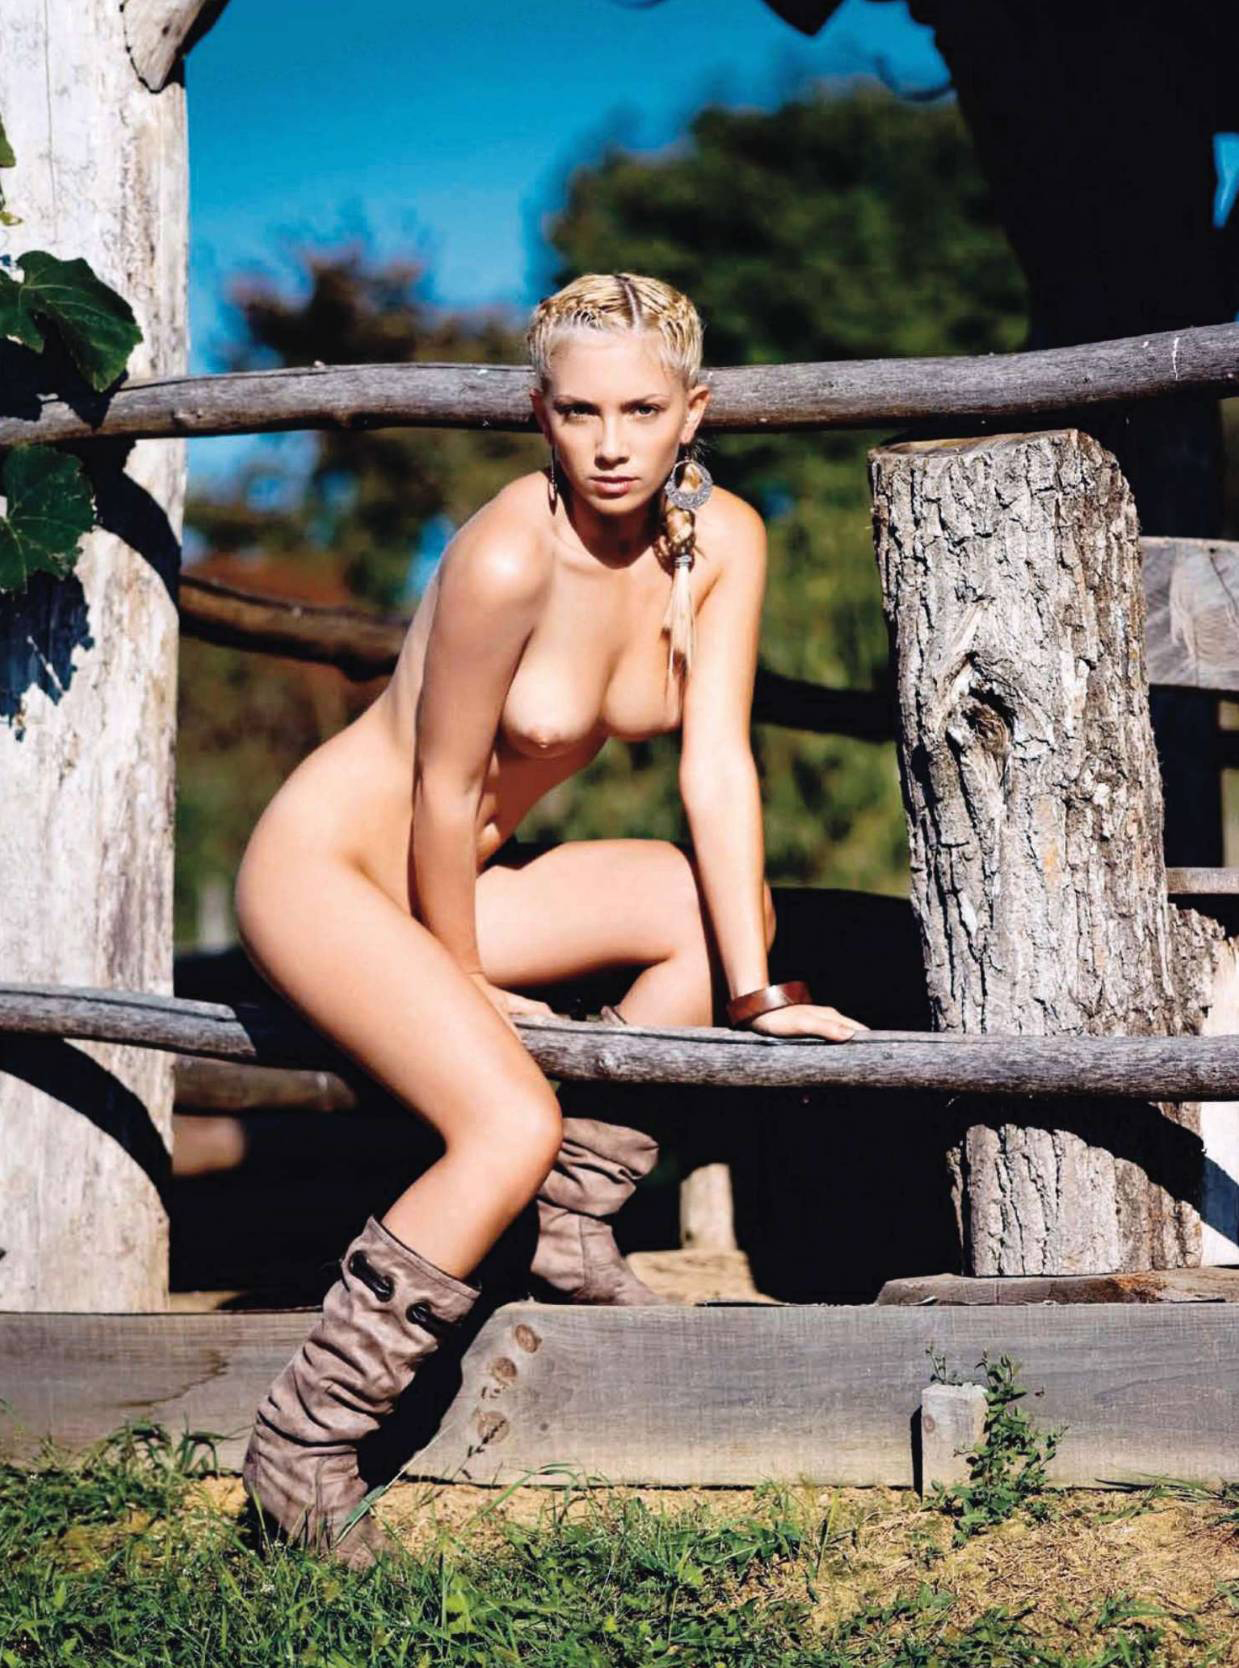 65025_Anamarija_Frlan_Playboy_2010_10_Croatia_05_123_426lo.jpg